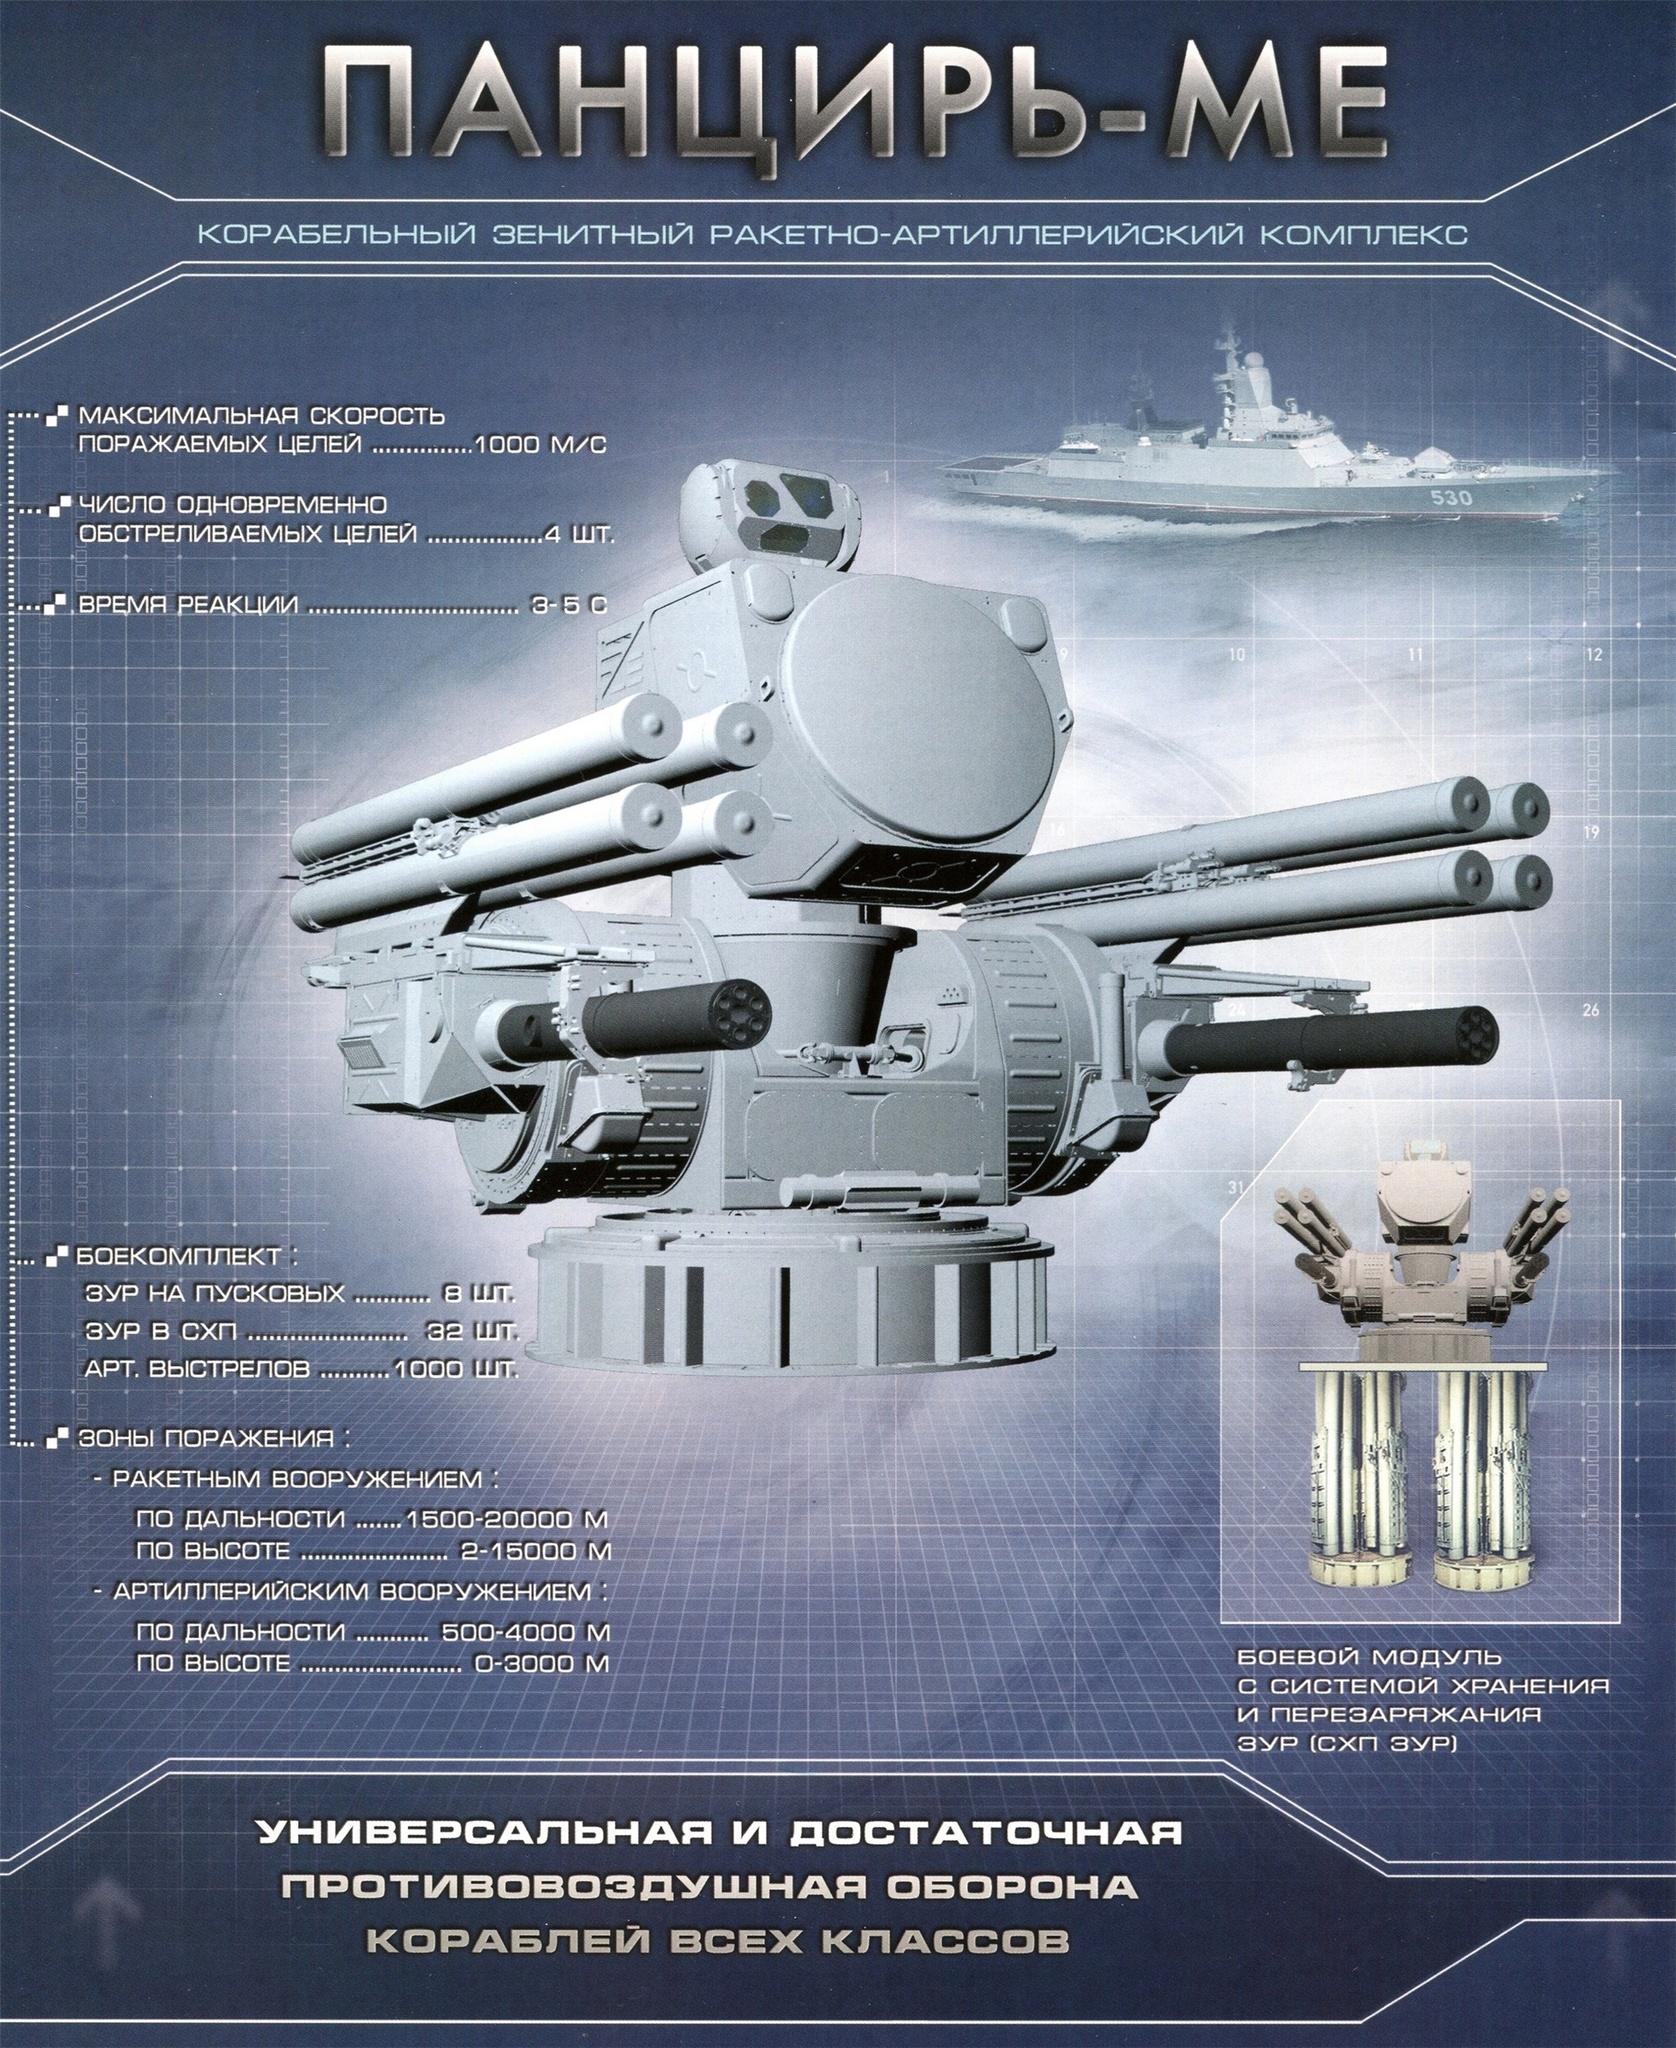 Naval Weapon Systems & Technology - Page 10 F_czAxOC5yYWRpa2FsLnJ1L2k1MjQvMTcwNi85OC80ZTg1ZDFkMmQwYjAuanBn